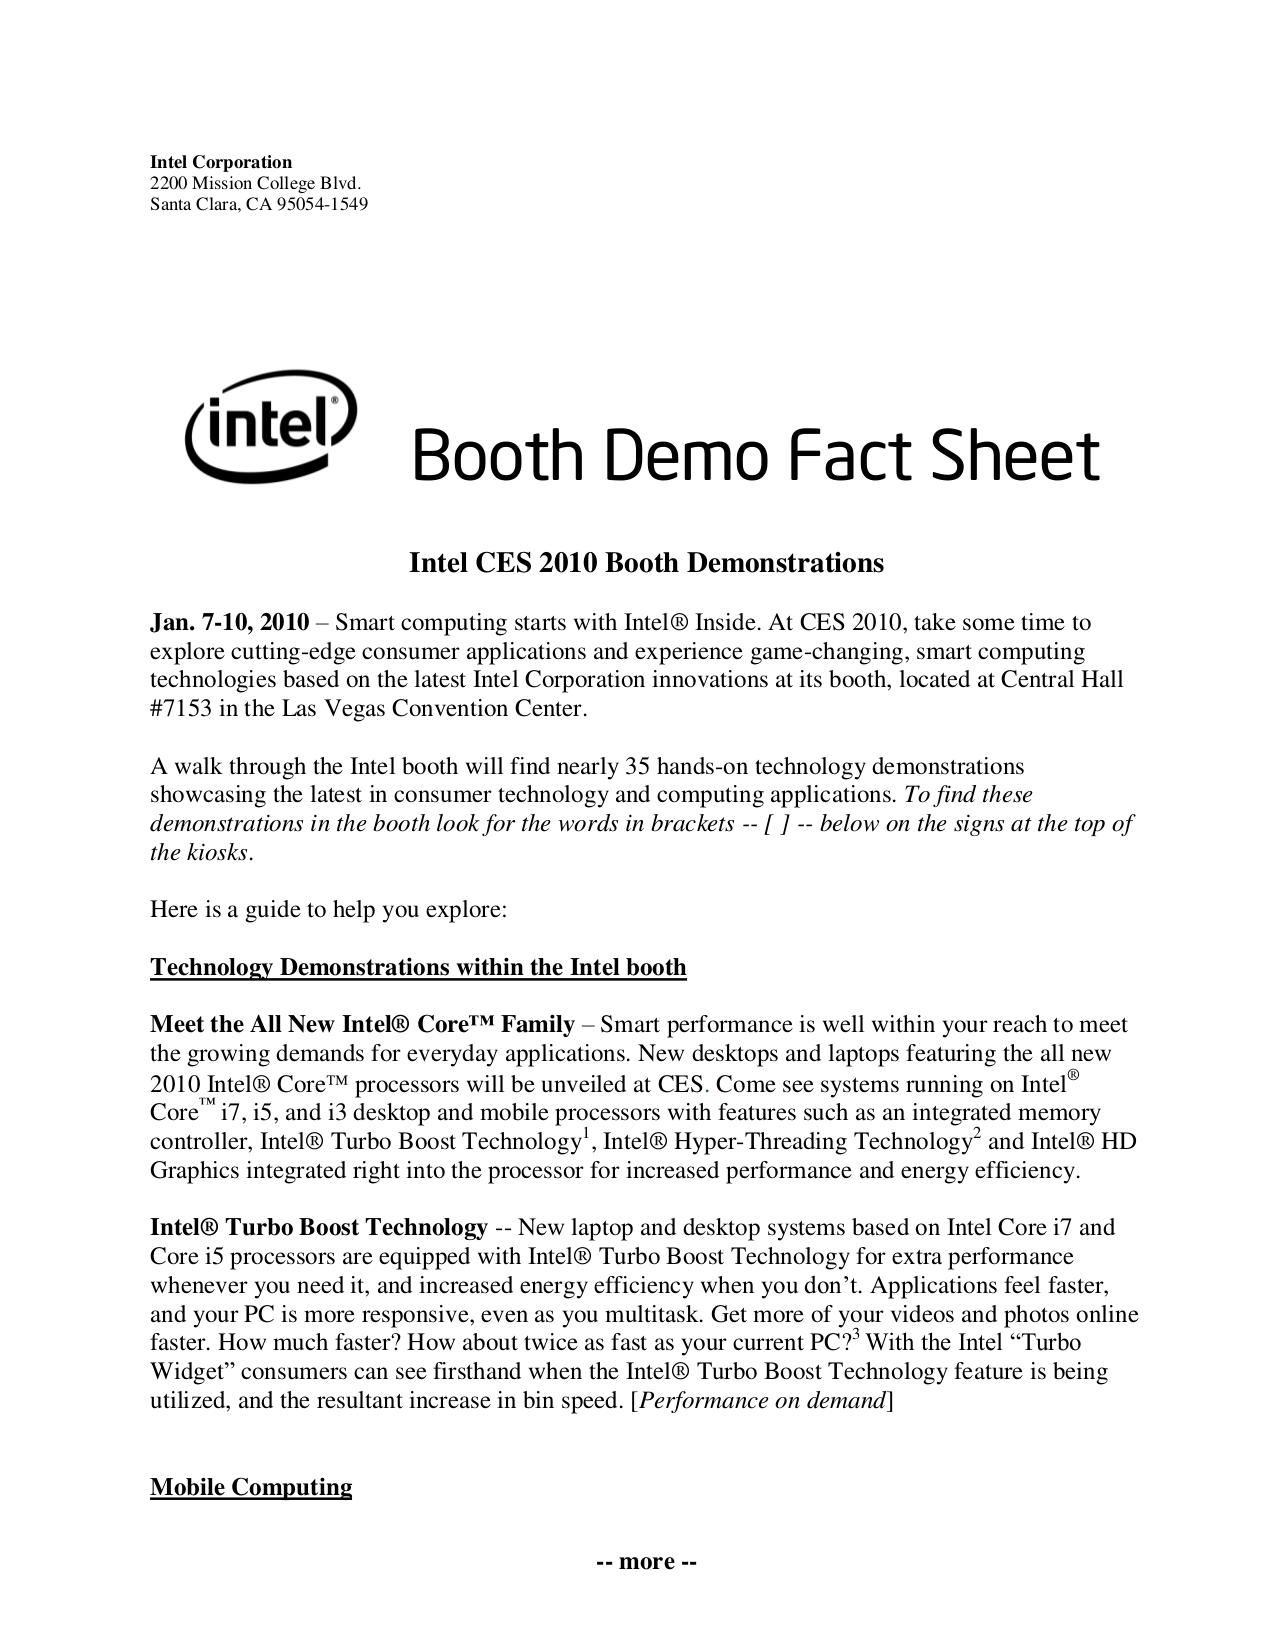 pdf for Viliv Laptop S7 manual